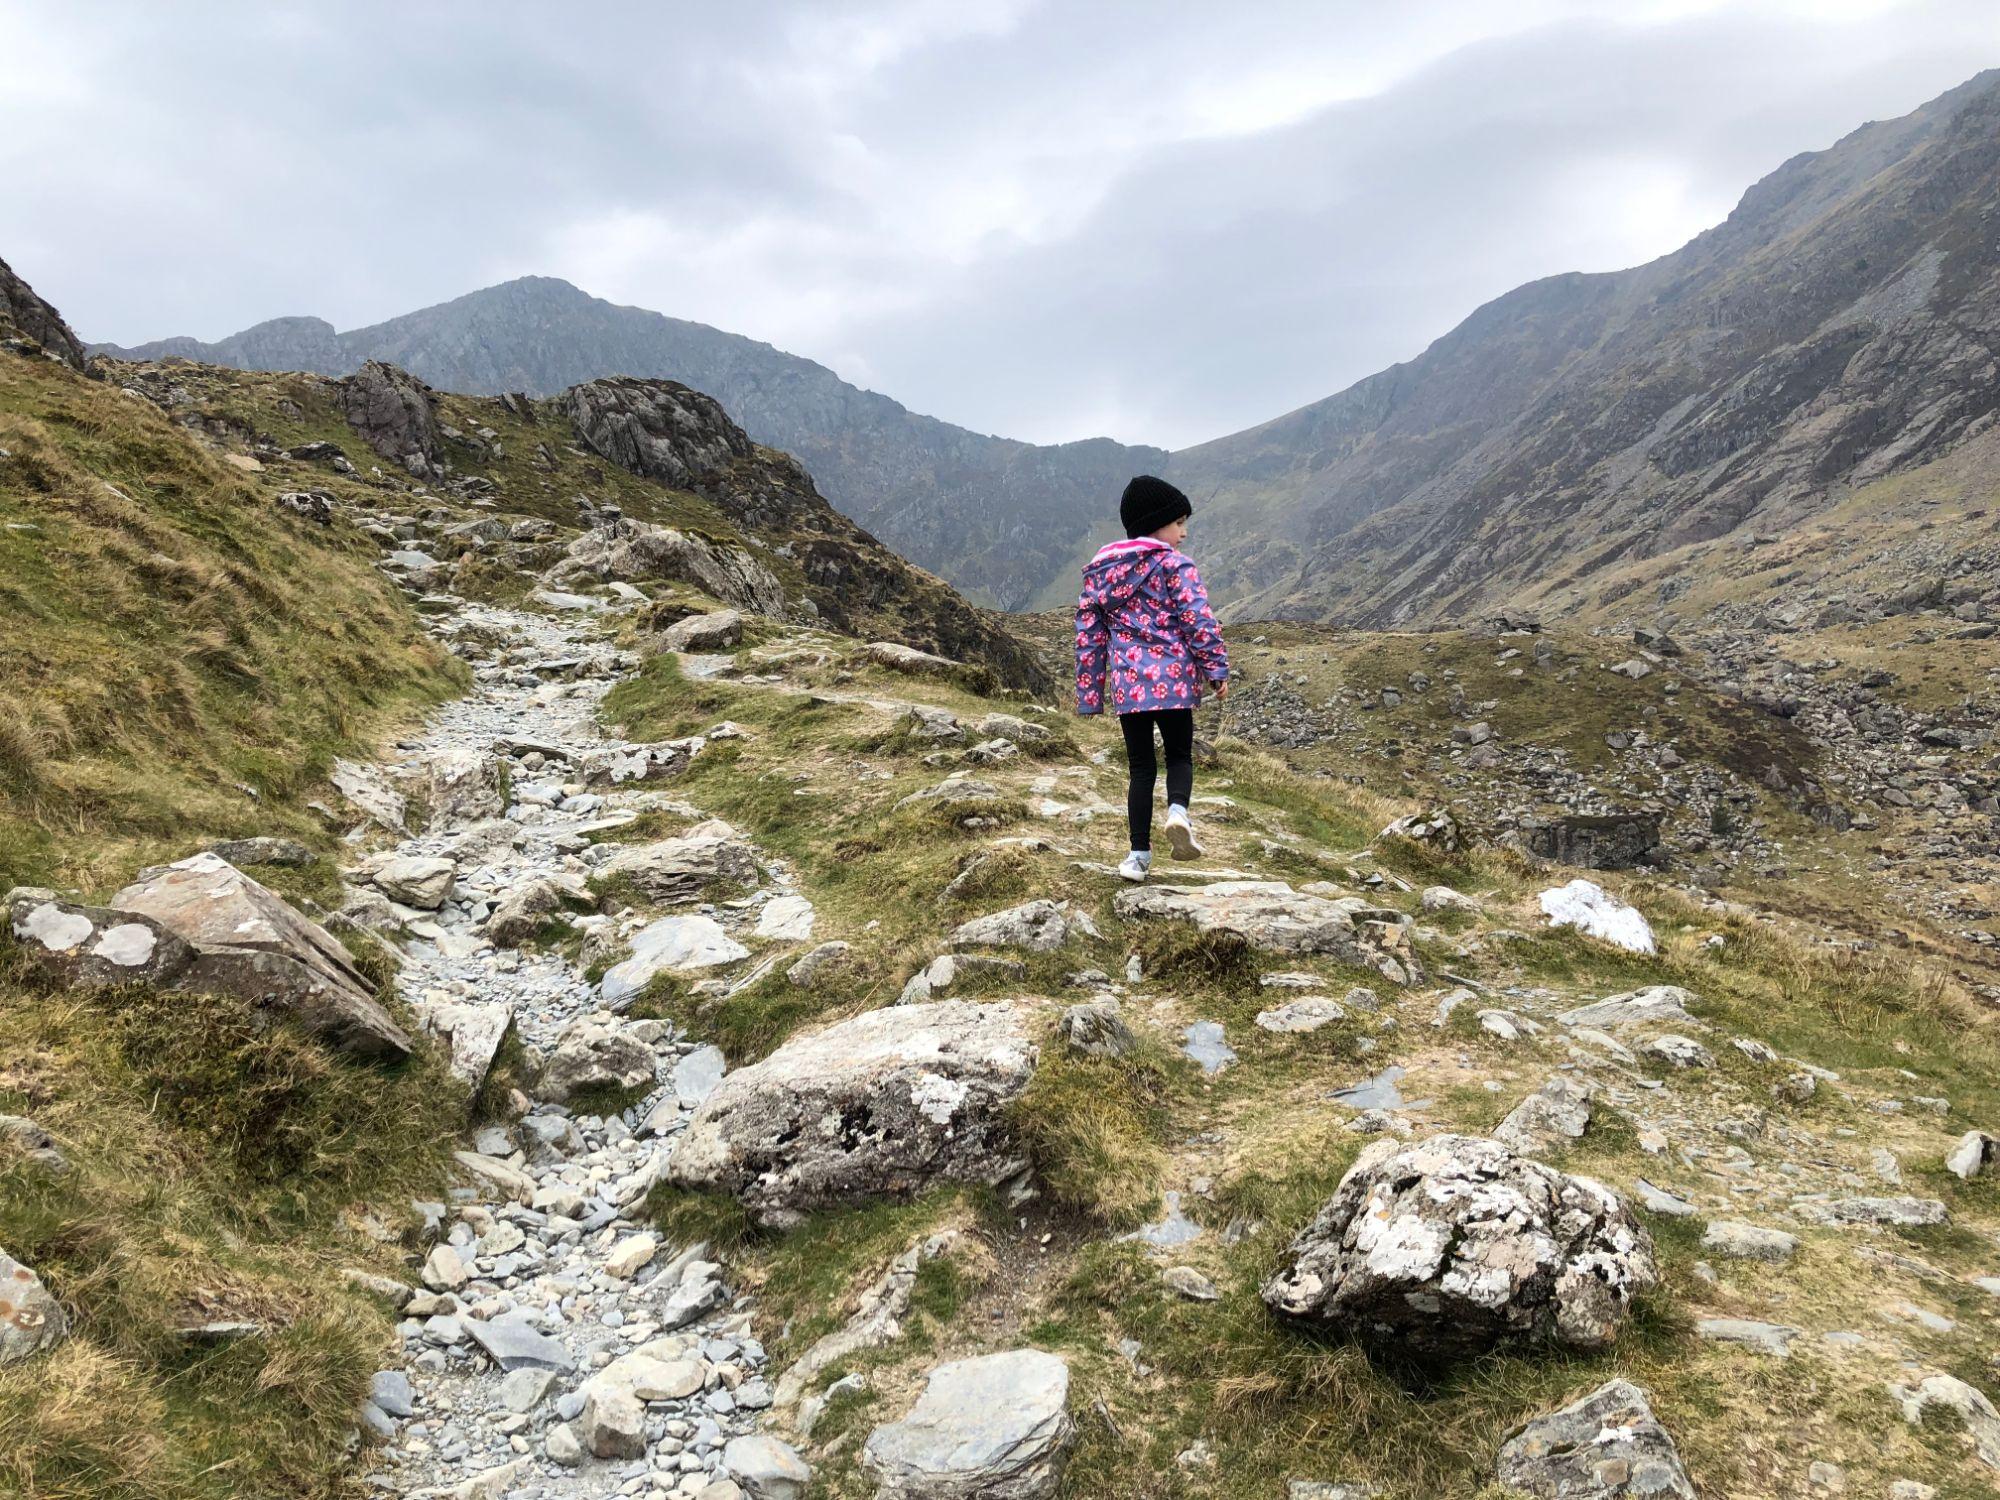 Free stock photo Cadair Idris Mountain Snowdonia Wales girl climbing